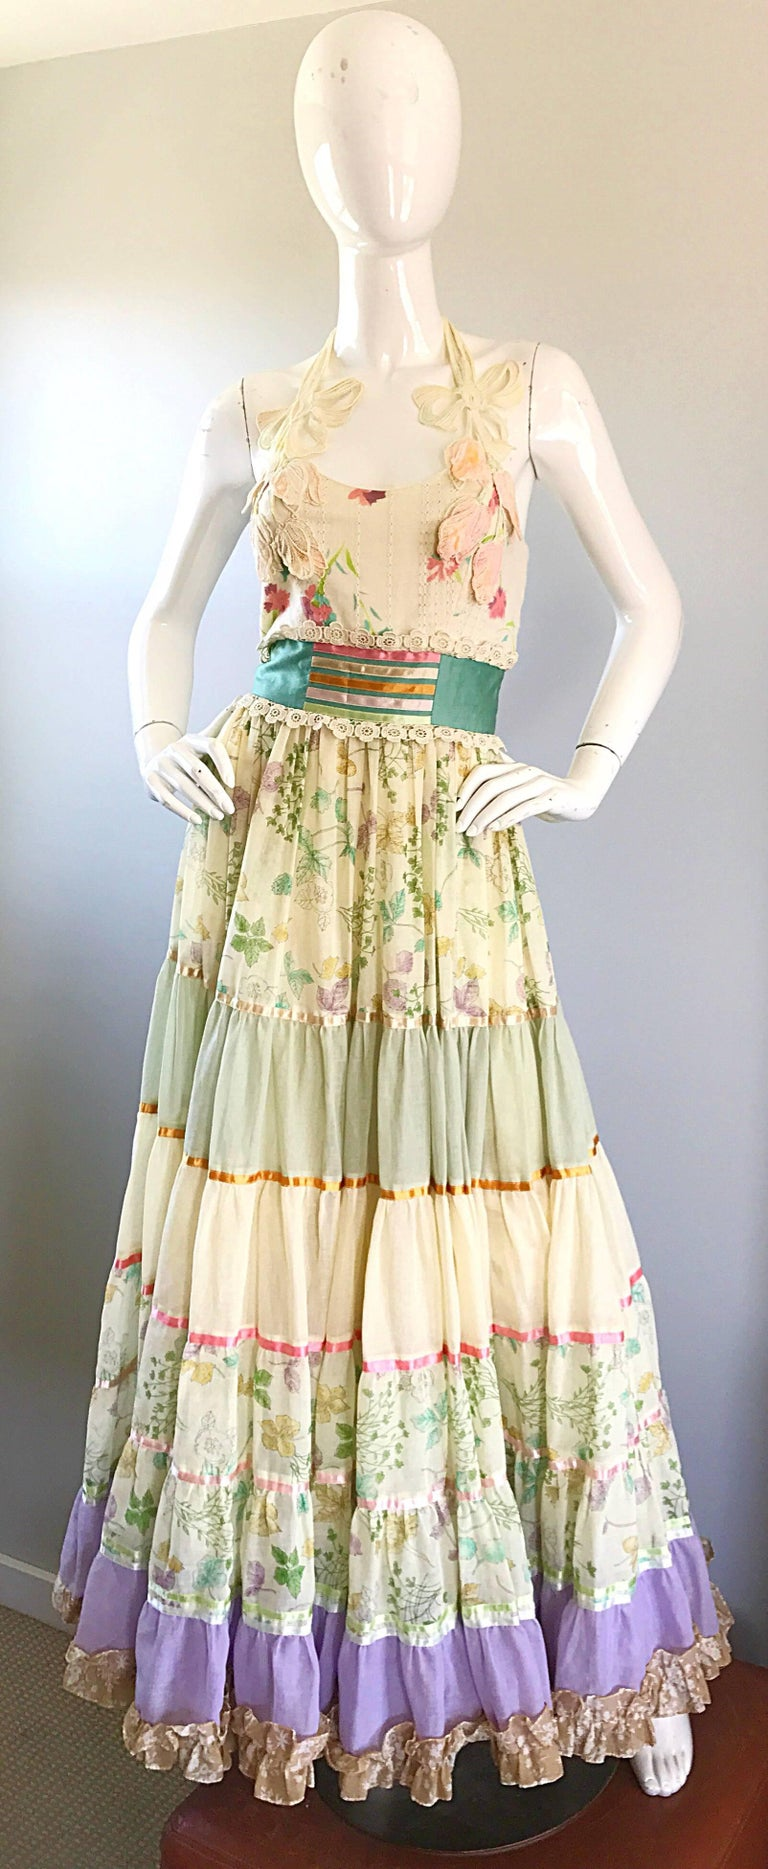 Giorgio di Sant Angelo Colorful Cotton Voile 70s Couture Maxi Dress Gown  For Sale 4